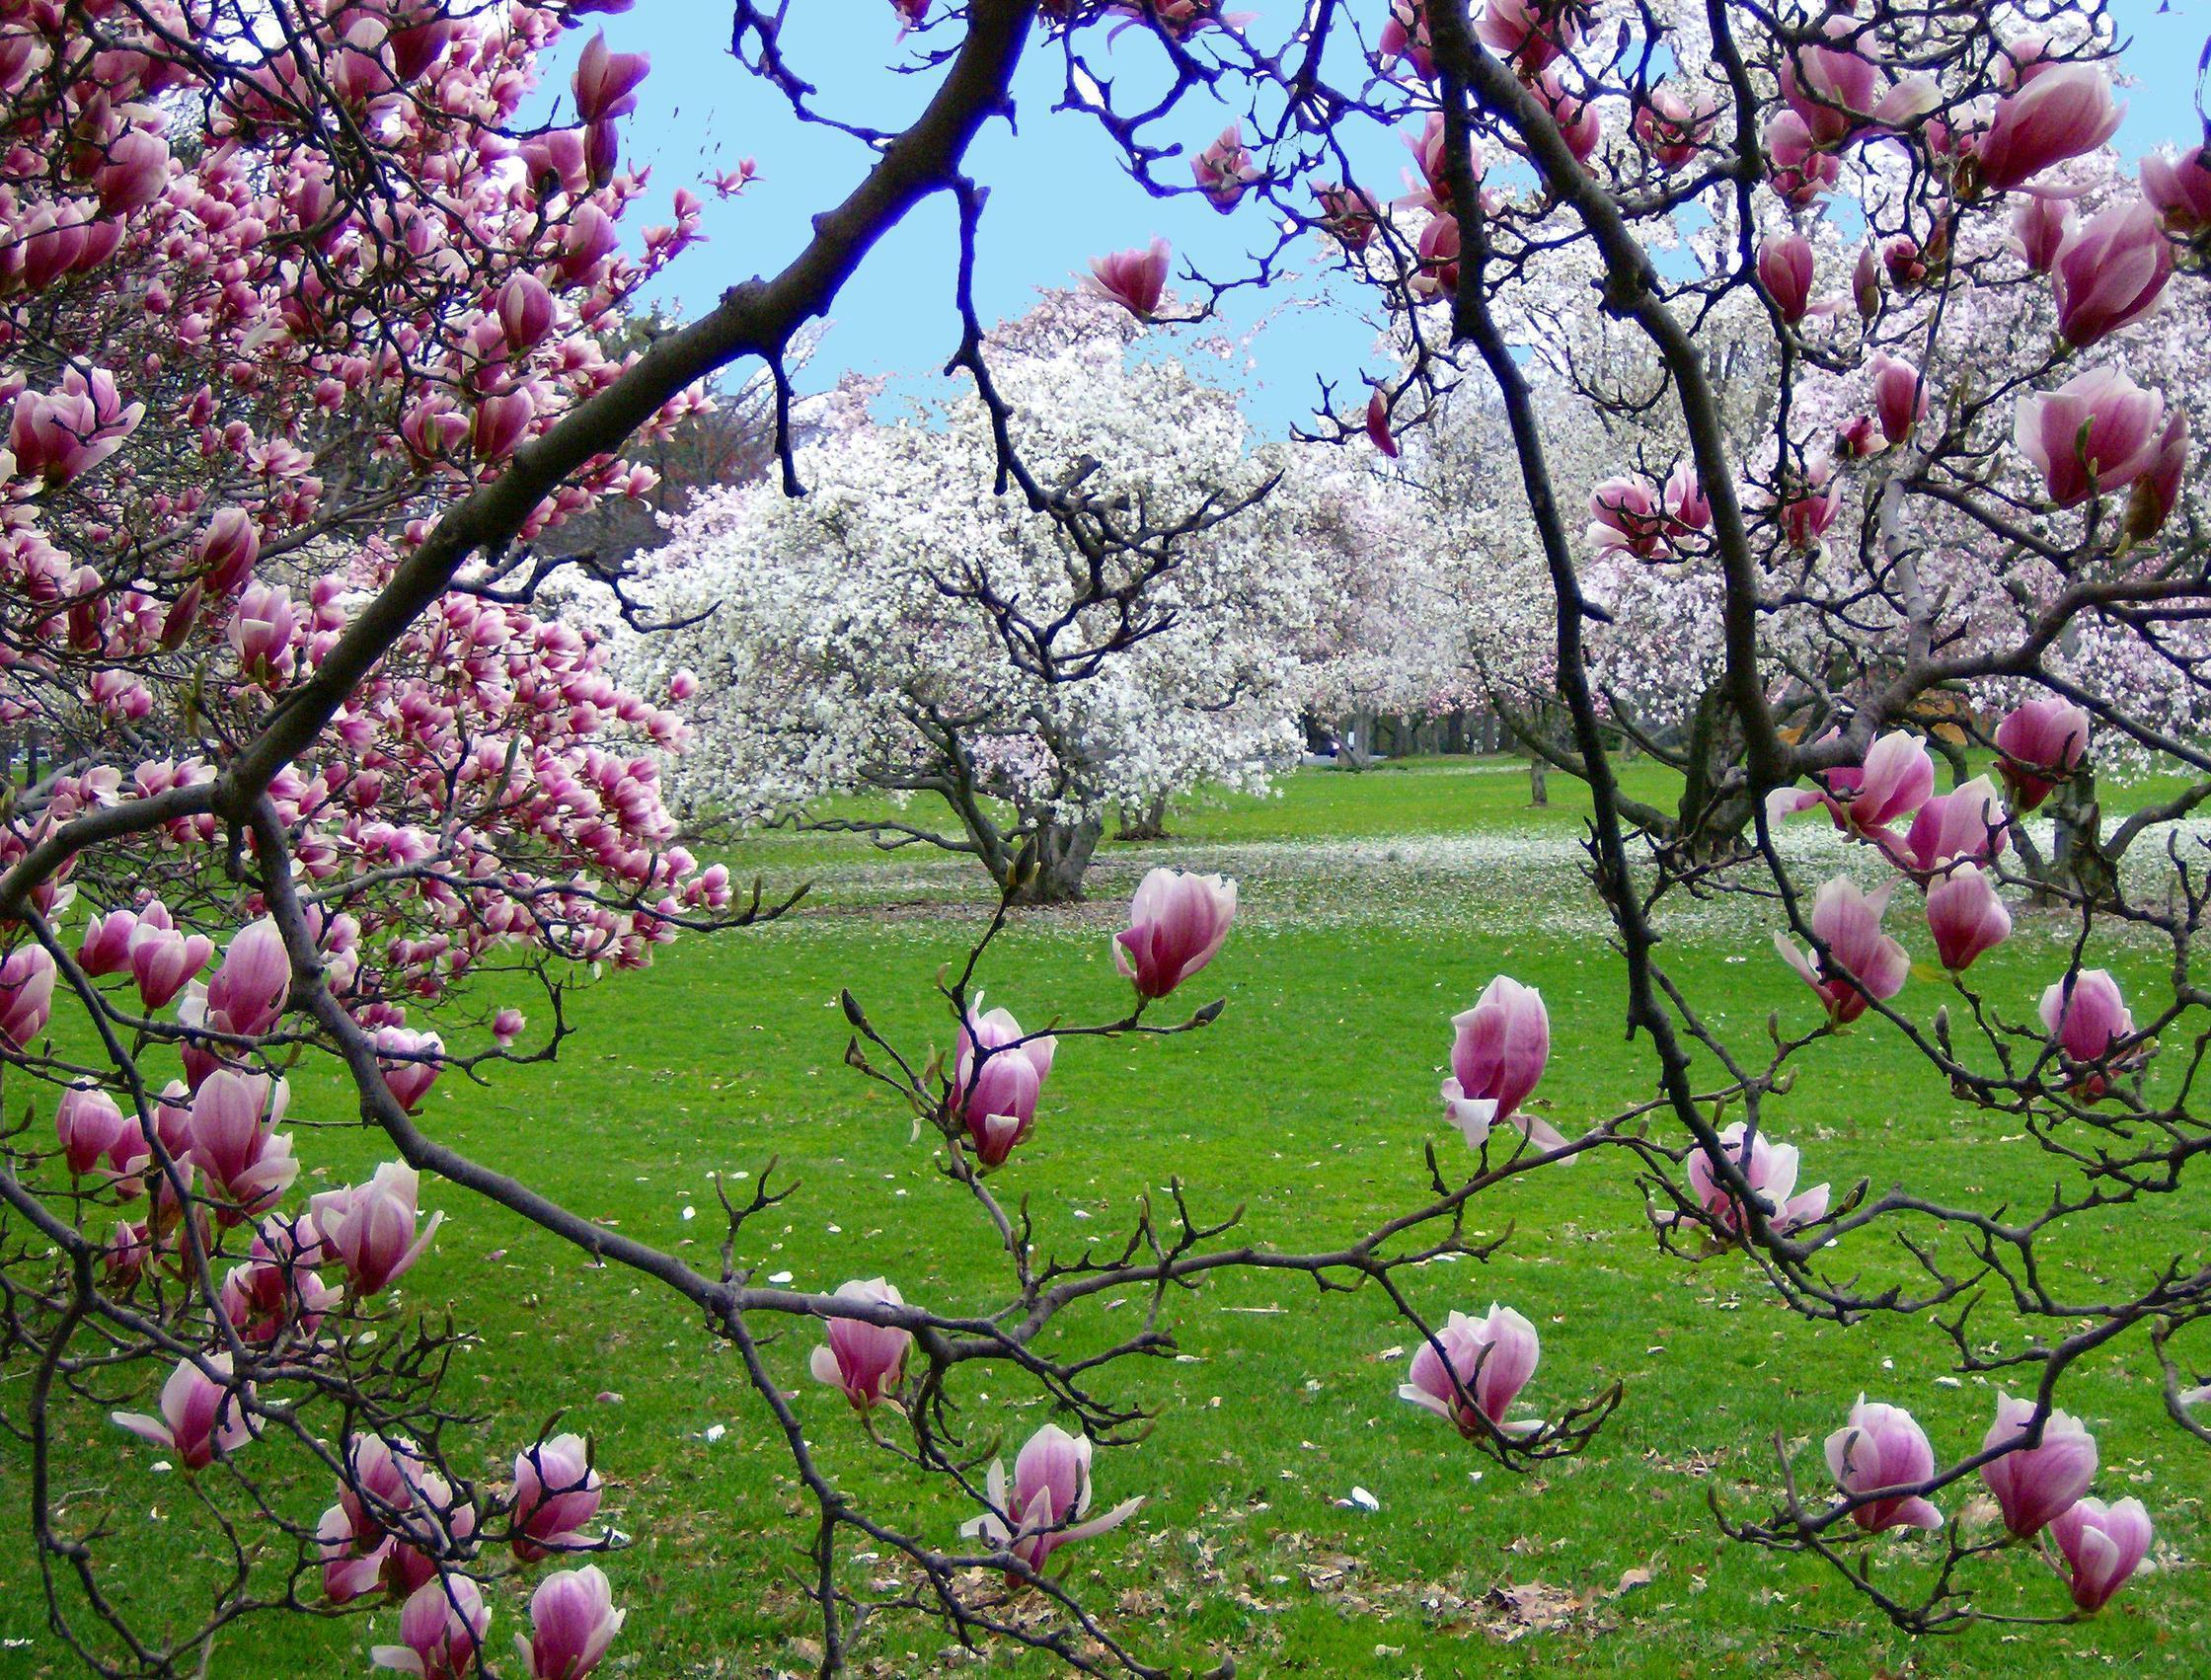 spring scenes wallpapers wallpaper cave